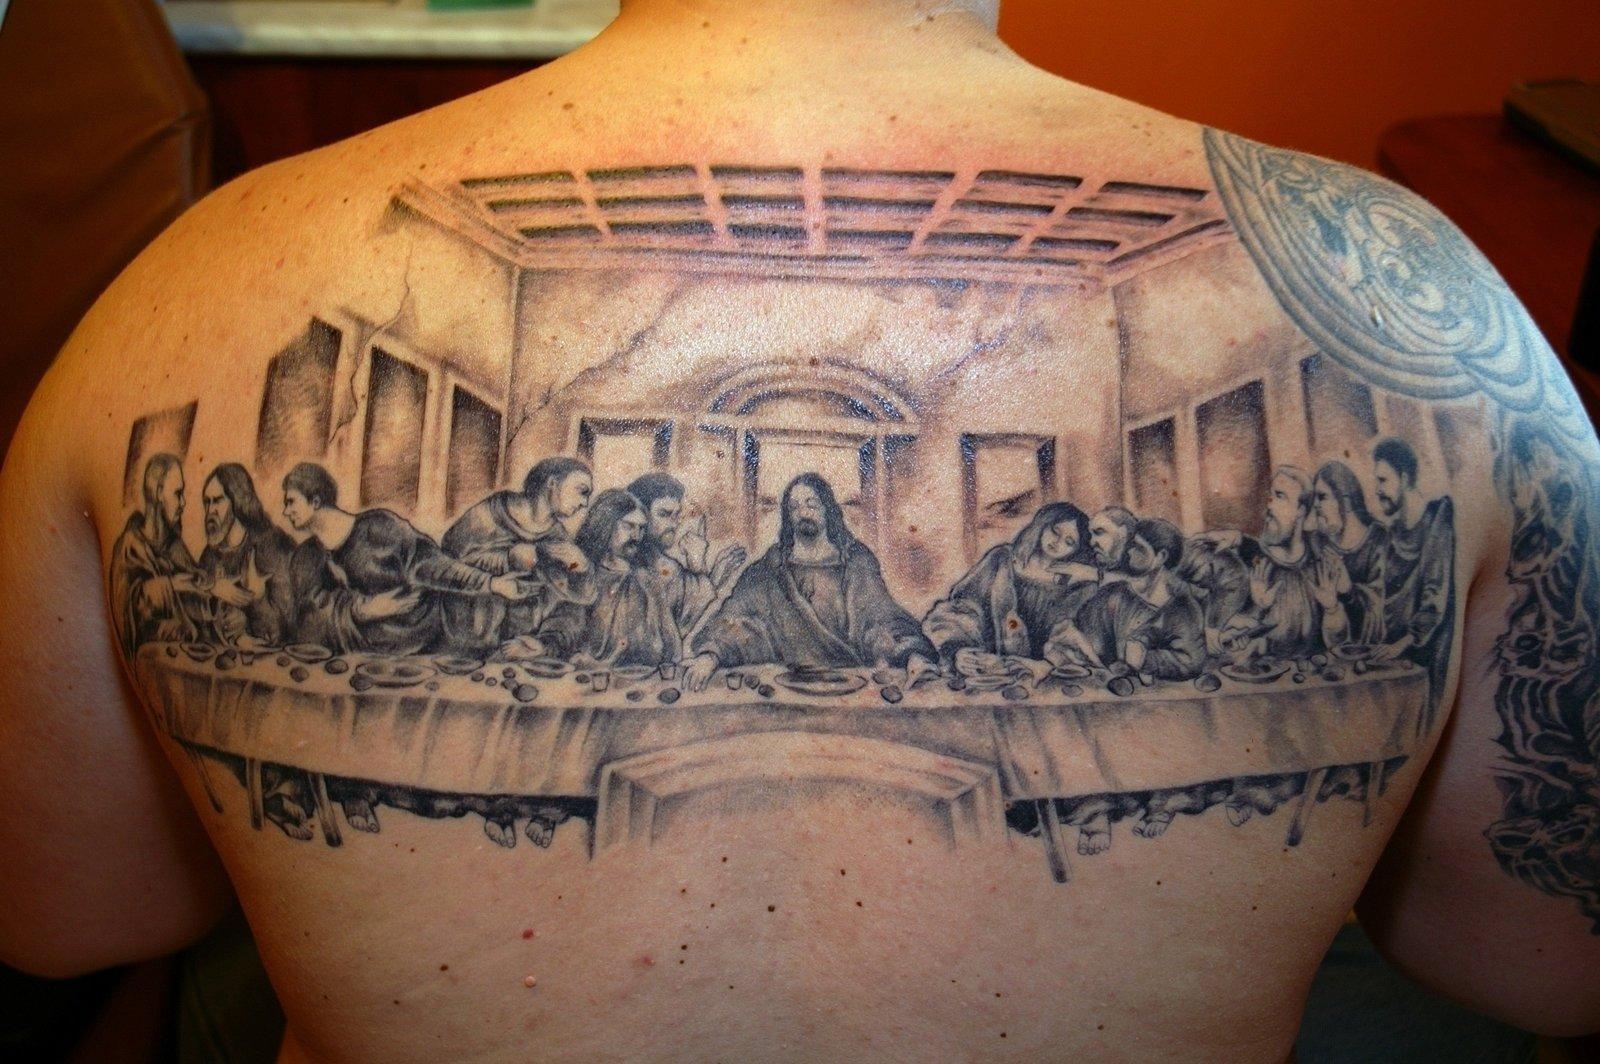 10 Pretty Christian Tattoo Ideas For Men christian tattoo ideas for men tat ideas on pinterest christian